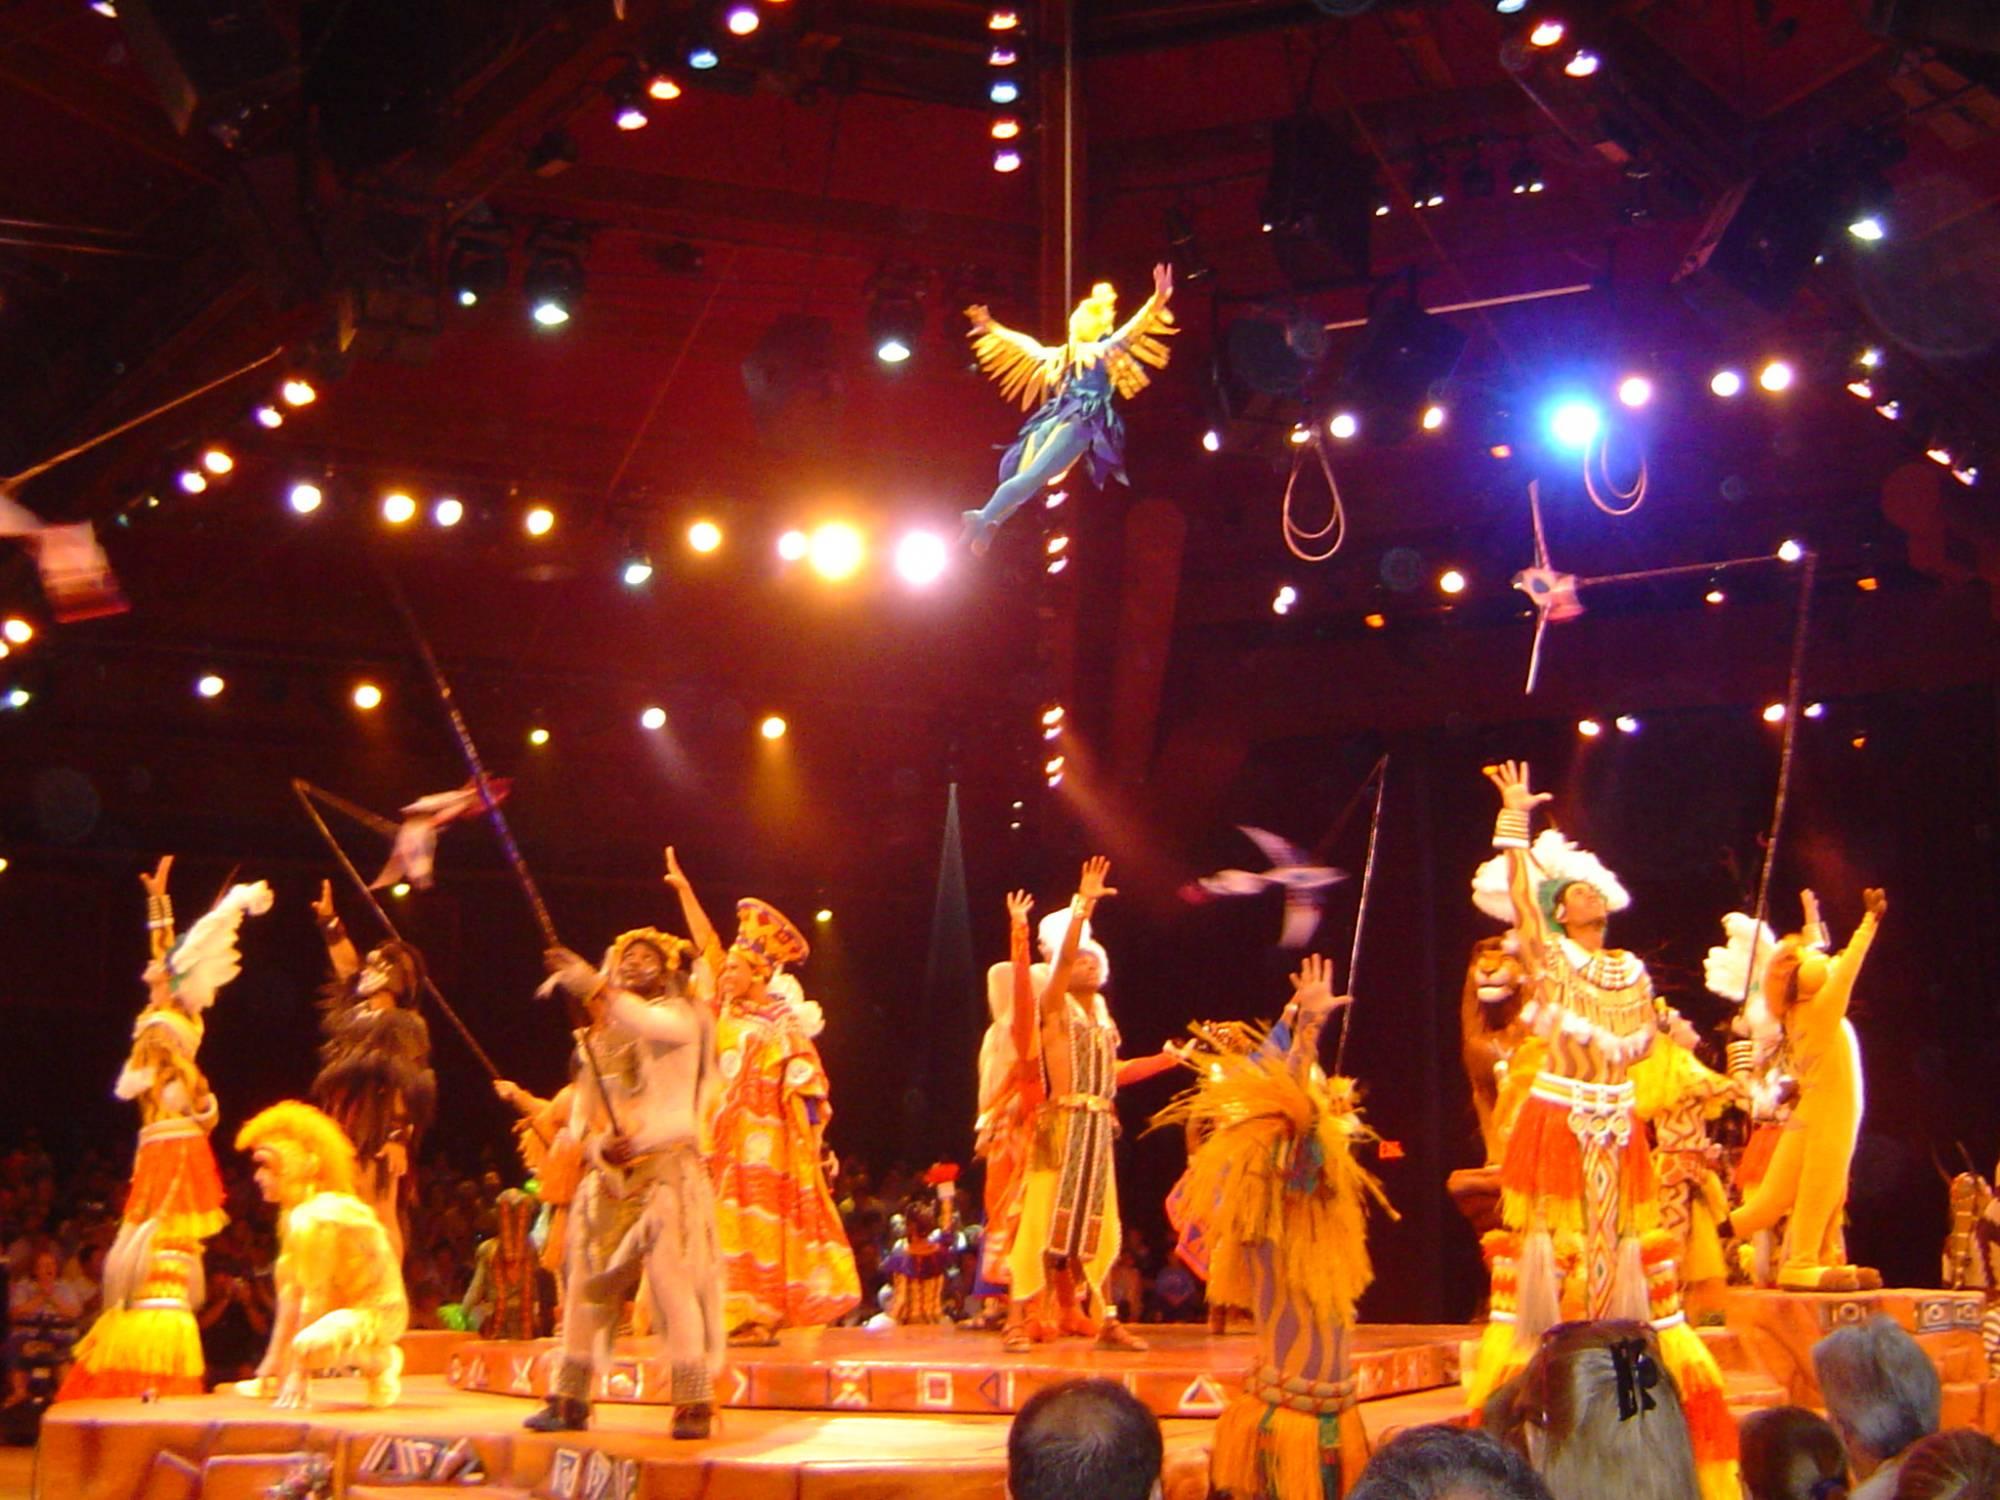 Enjoy Walt Disney World without ever stepping foot on a roller coaster |PassPorter.com